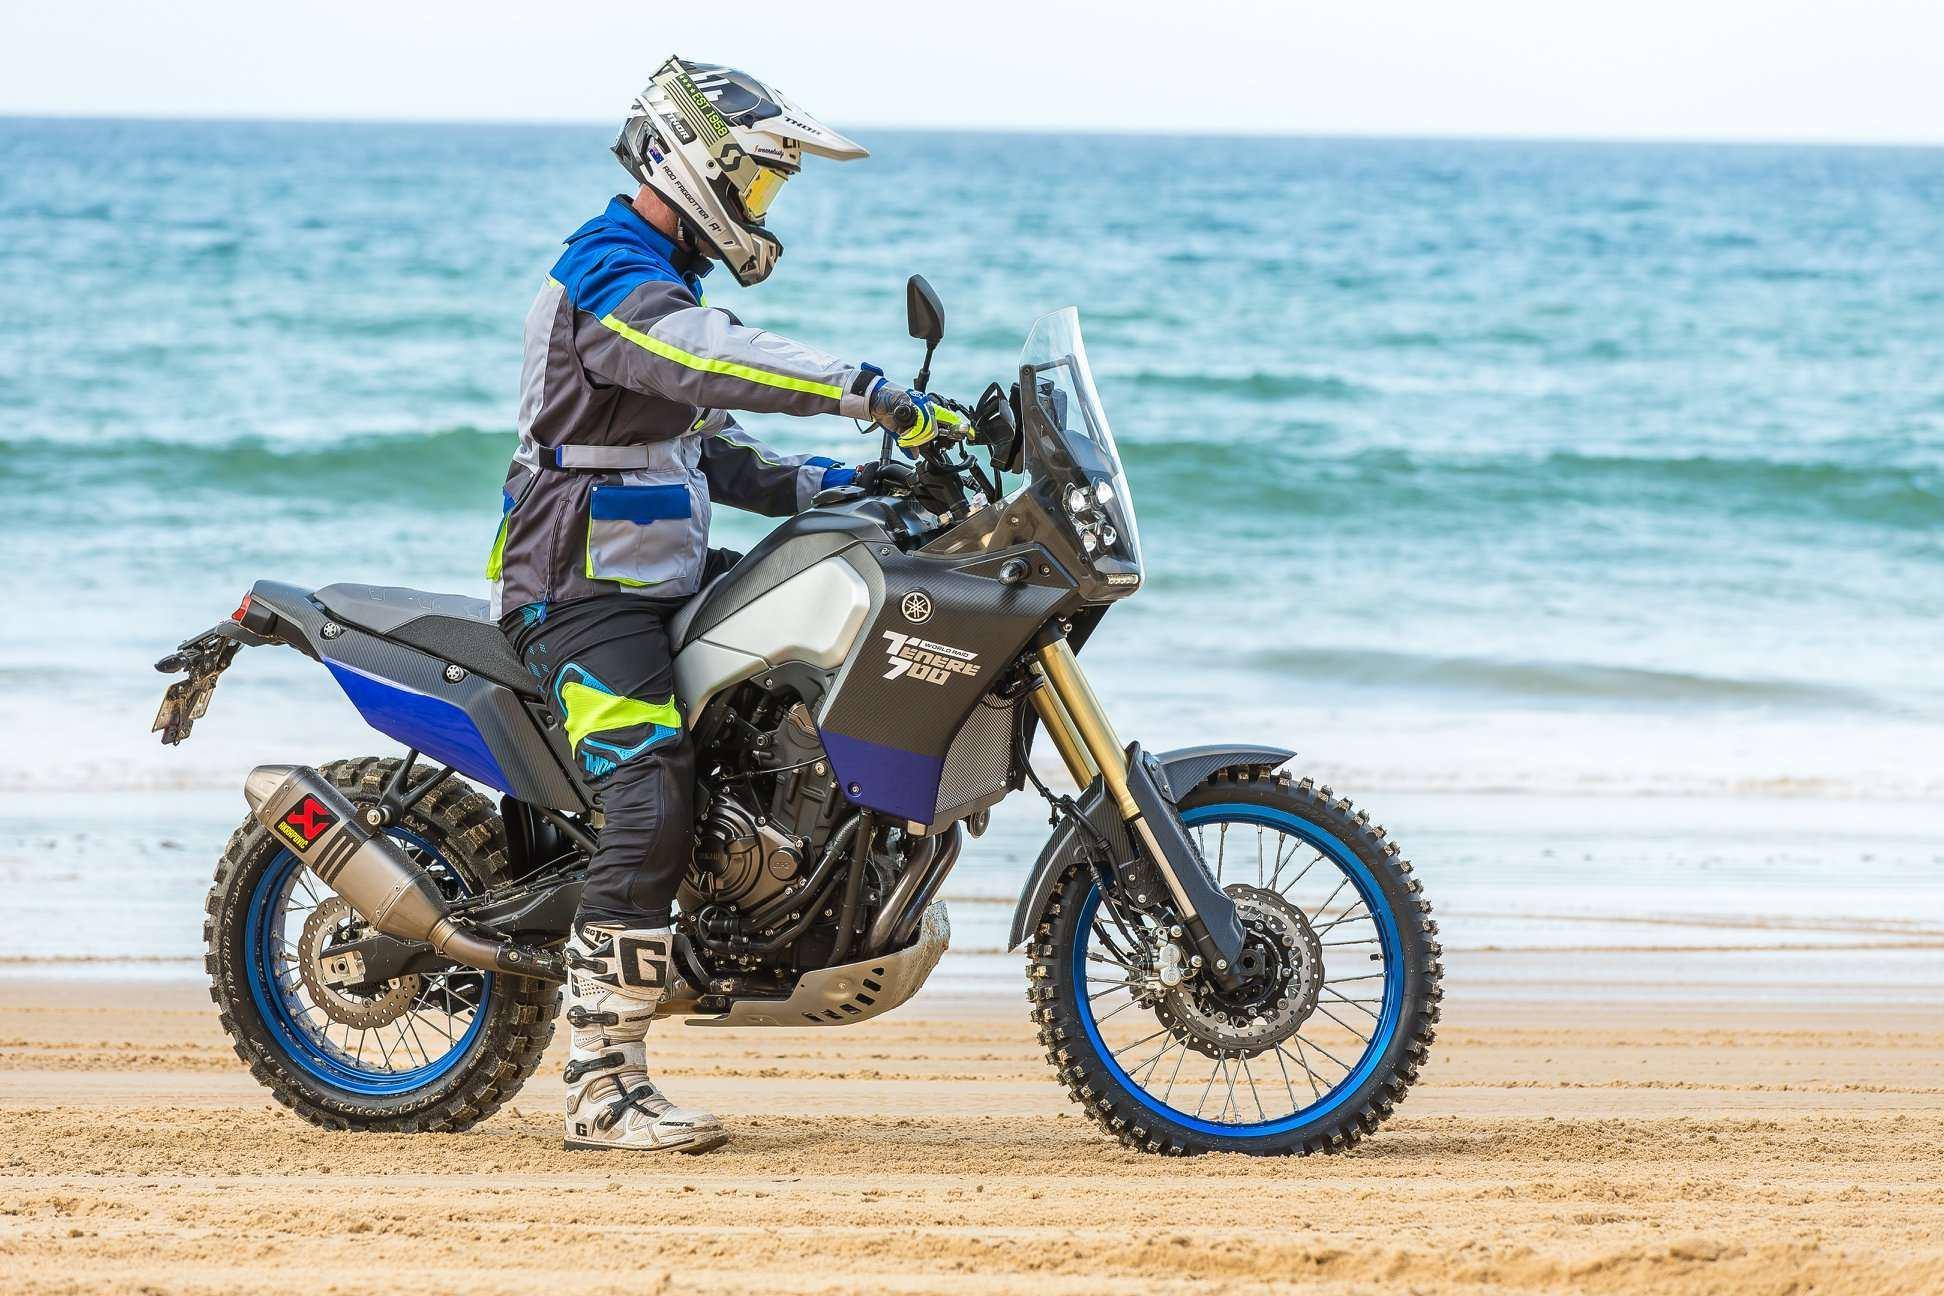 Yamaha Fz Adventure